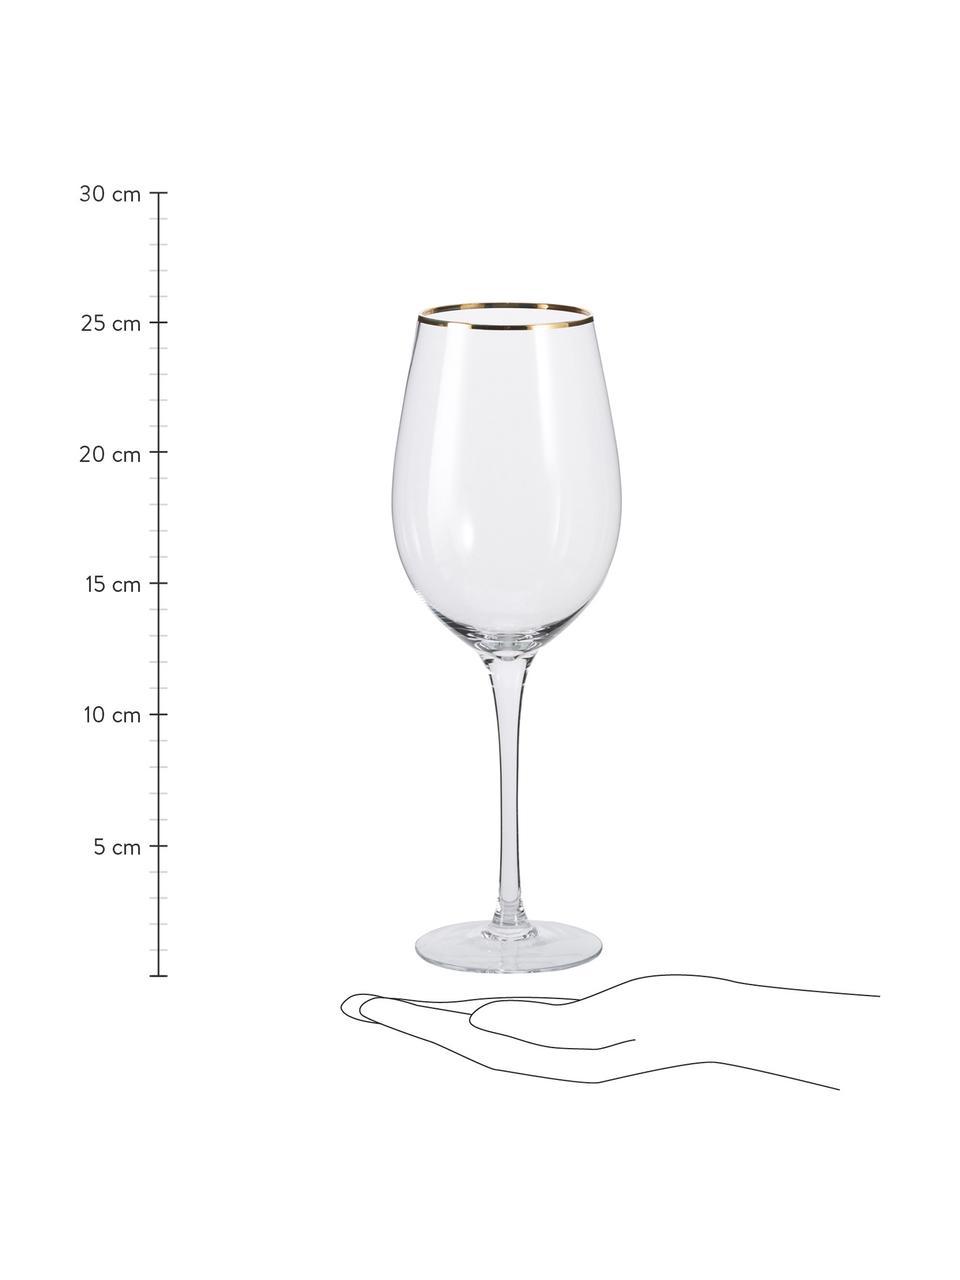 Weingläser Chloe in Transparent mit Goldrand, 4 Stück, Glas, Transparent, Ø 9 x H 26 cm